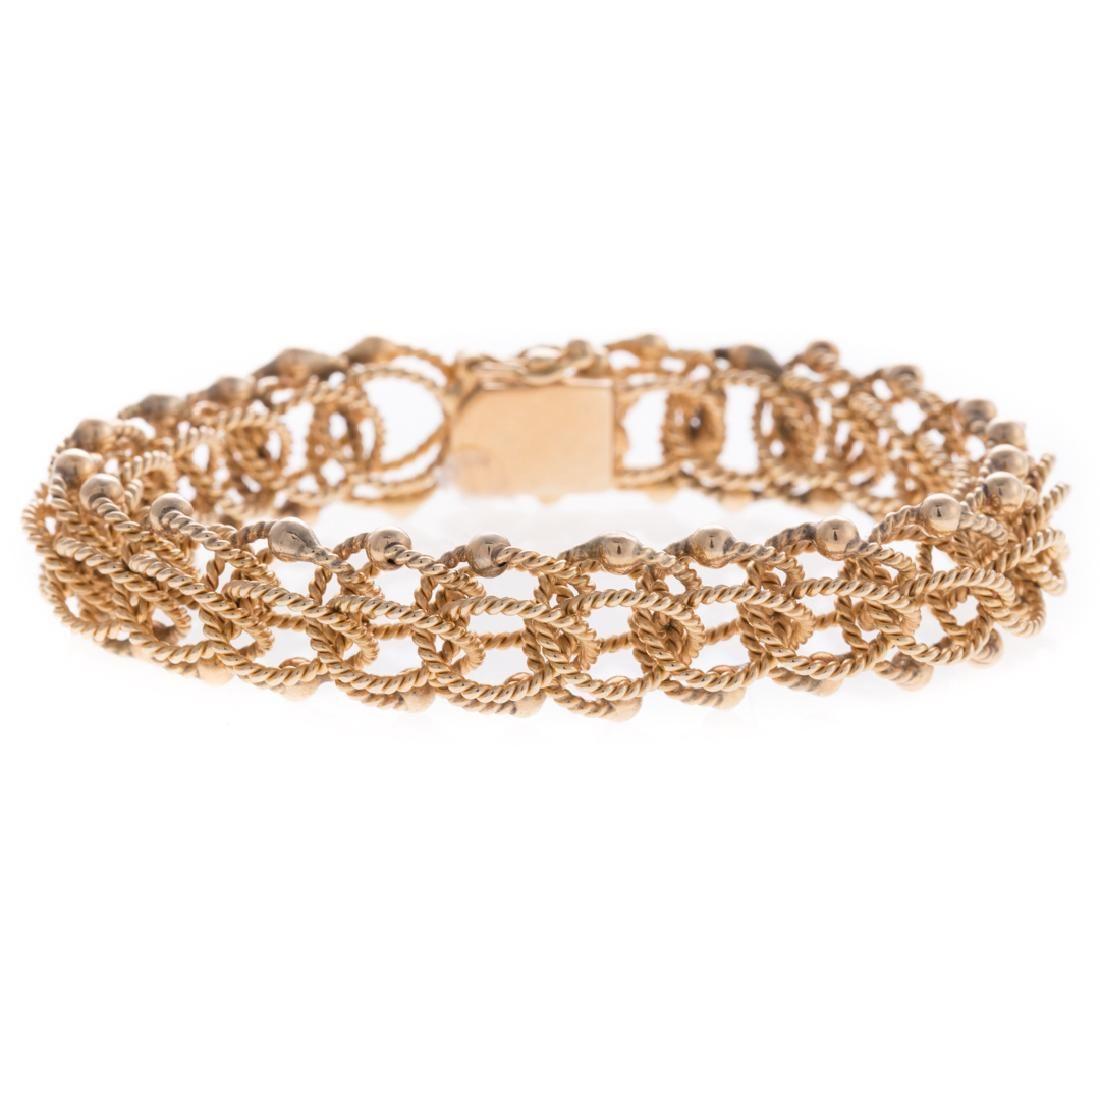 A Lady's Woven Rope Bracelet in 14K Gold